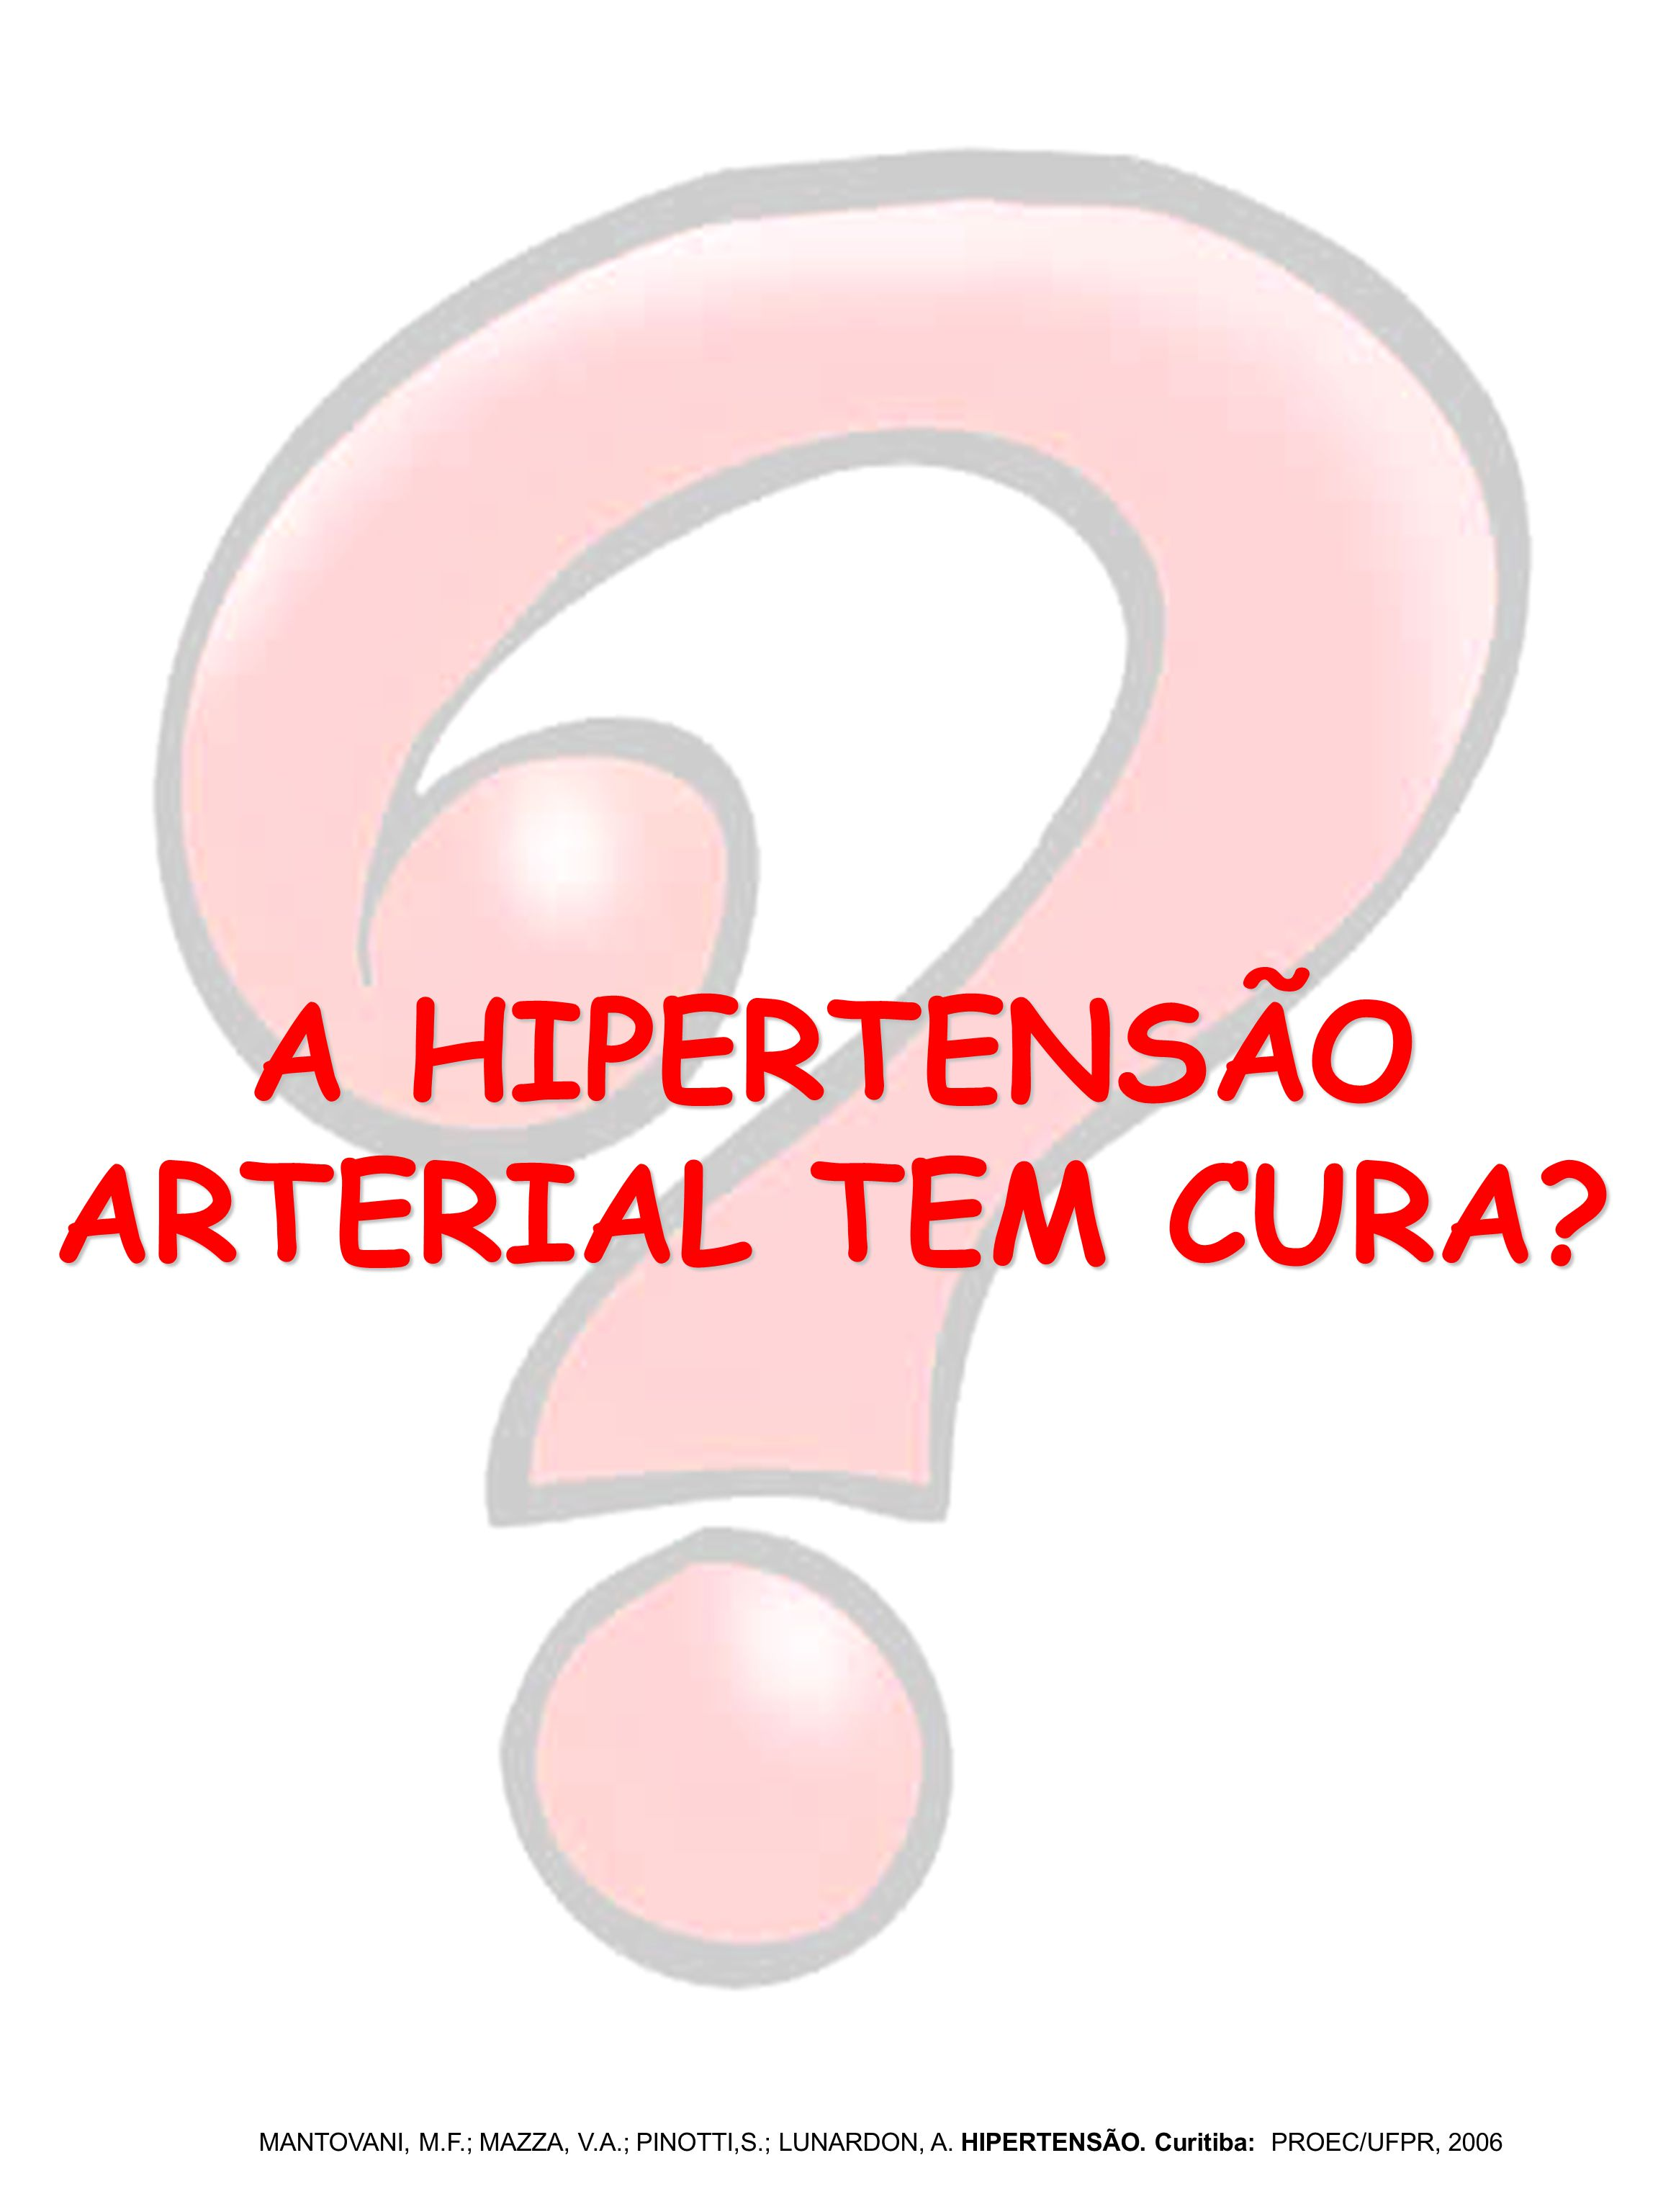 A HIPERTENSÃO ARTERIAL TEM CURA? MANTOVANI, M.F.; MAZZA, V.A.; PINOTTI,S.; LUNARDON, A. HIPERTENSÃO. Curitiba: PROEC/UFPR, 2006